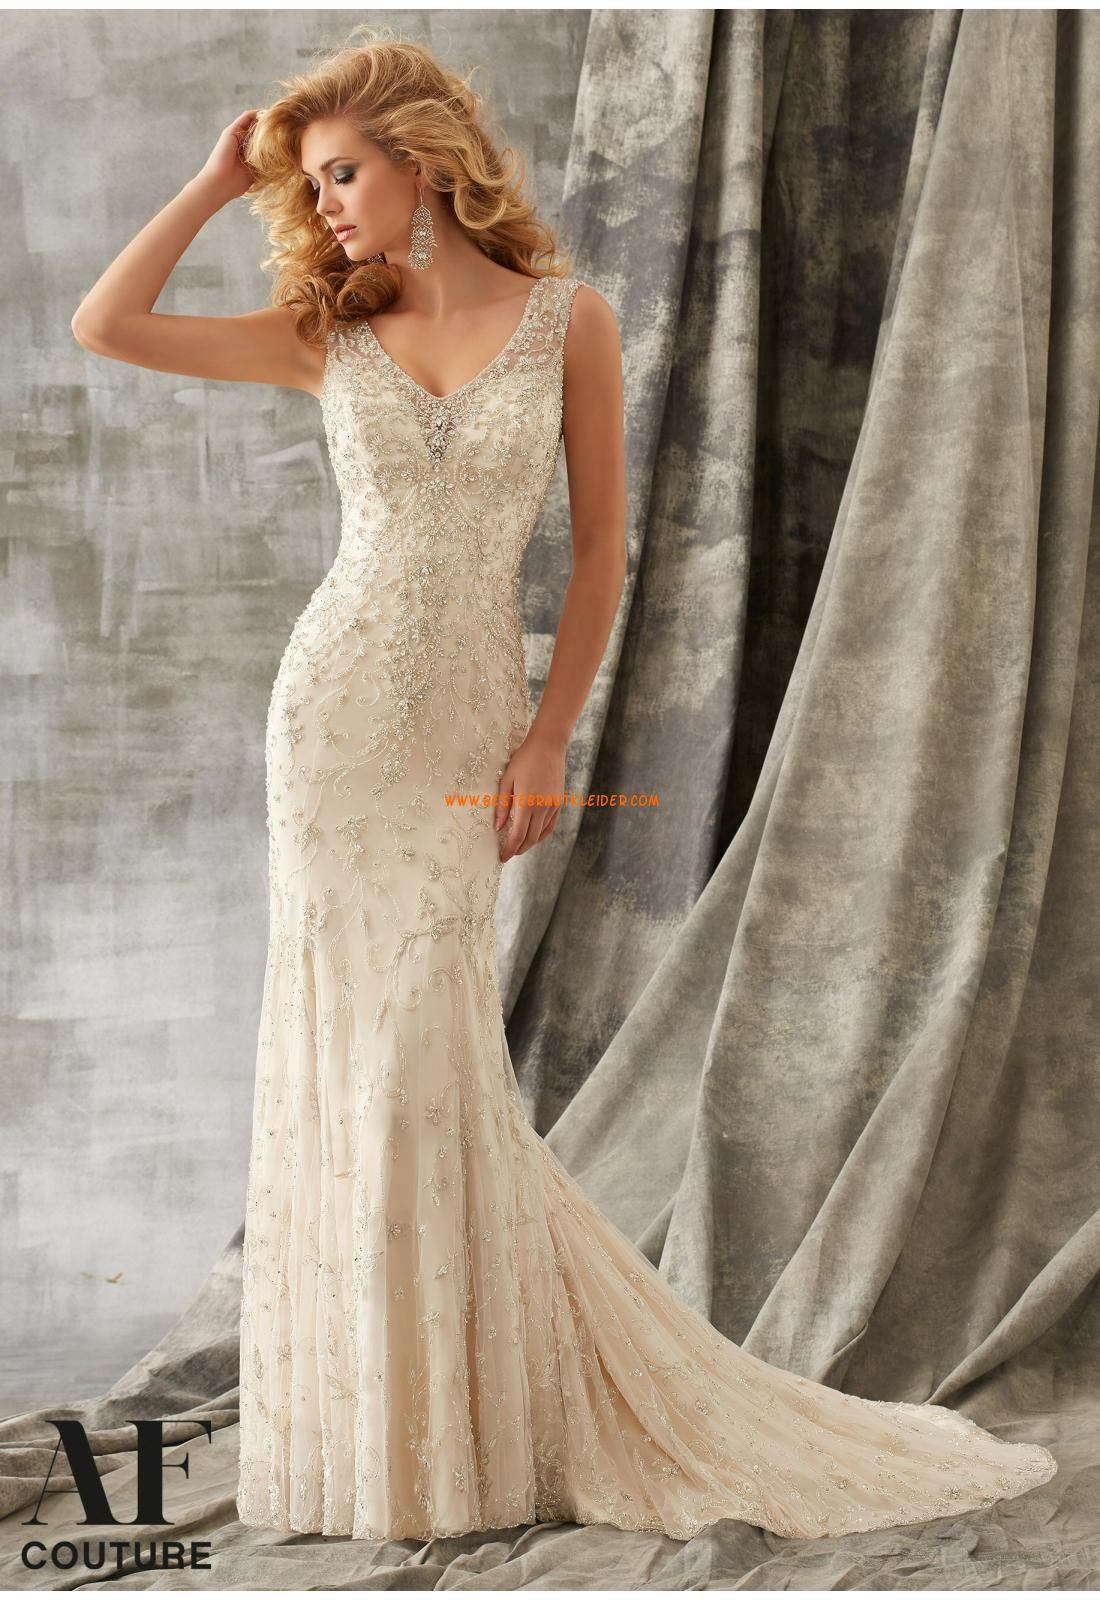 Angelina Faccenda Meerjungfrau Elegante Luxuriose Brautkleider Aus